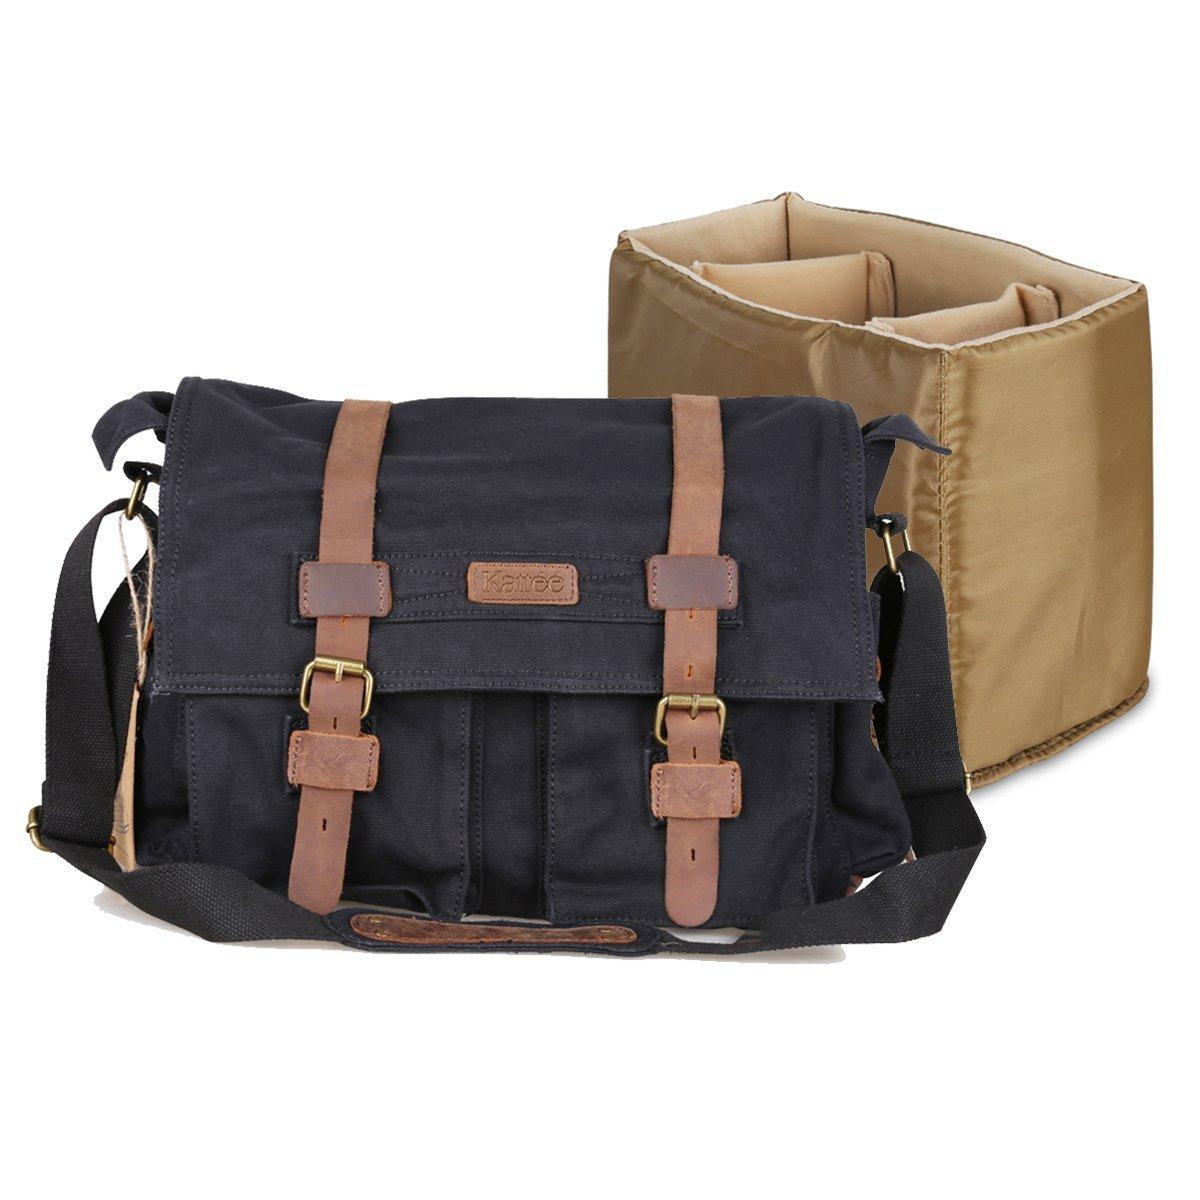 Kattee Men s Canvas Leather DSLR SLR Vintage Camera Messenger Bag   Amazon.co.uk  Luggage 61c5afa0ab3d8